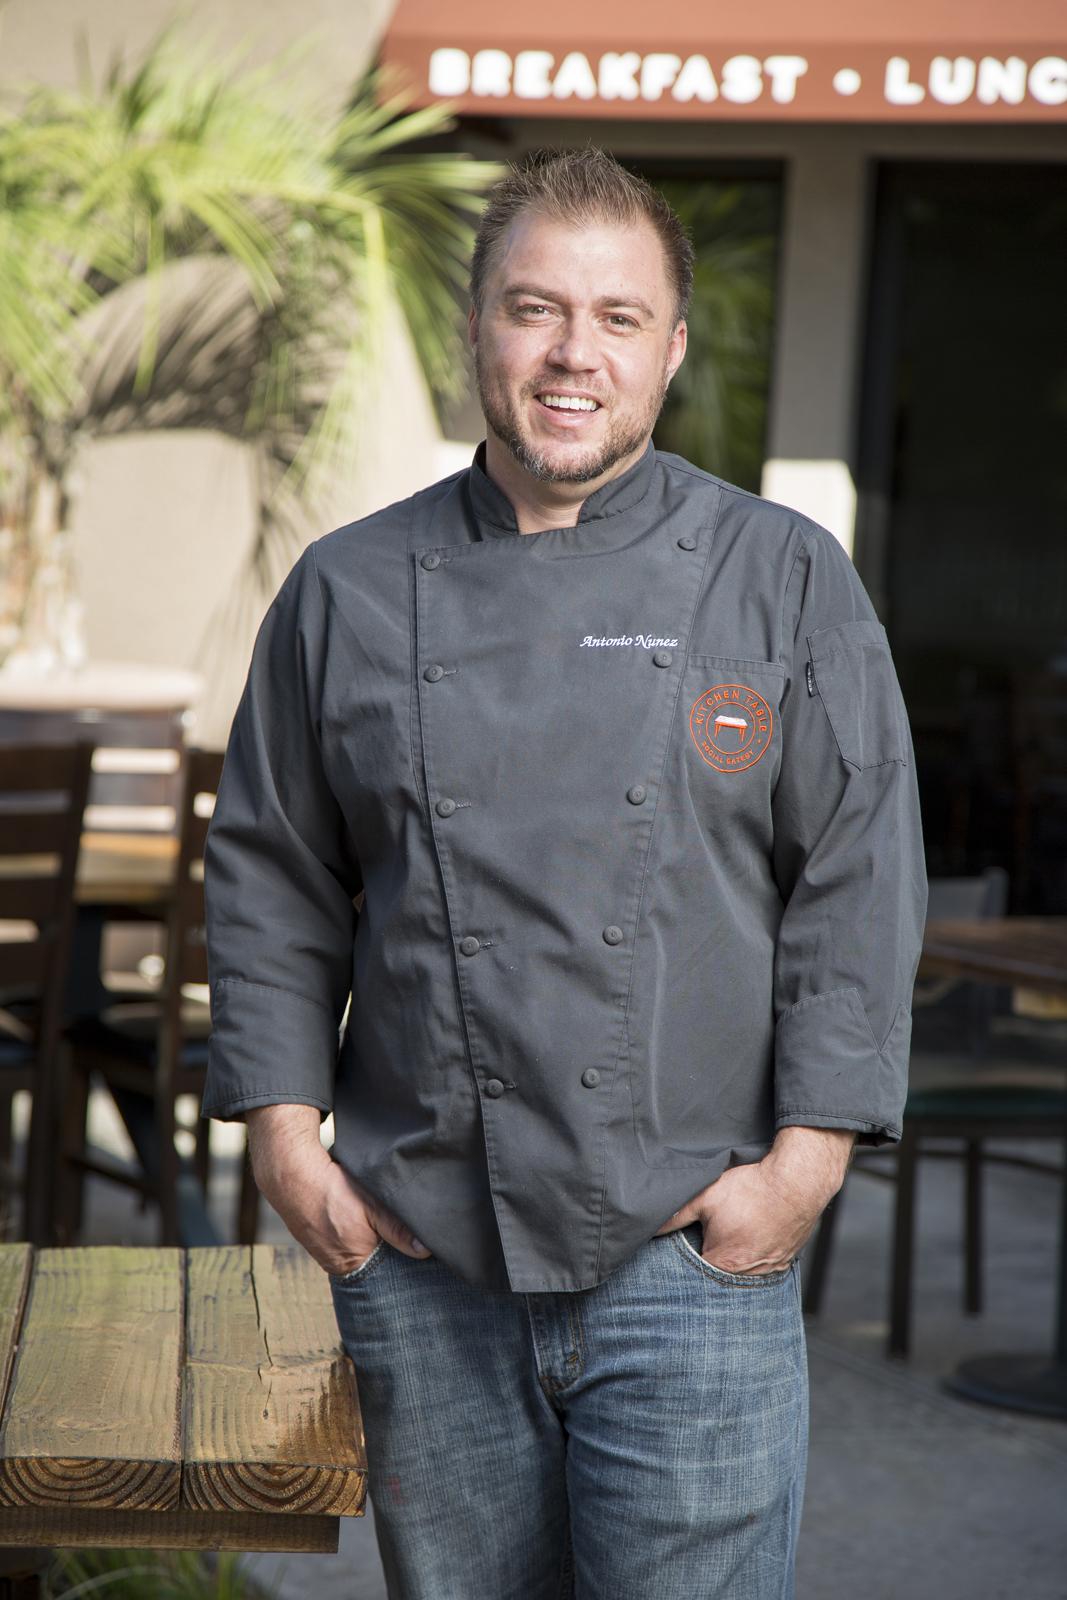 antonio nunez builds a winner in the neighborhood kitchen table las vegas